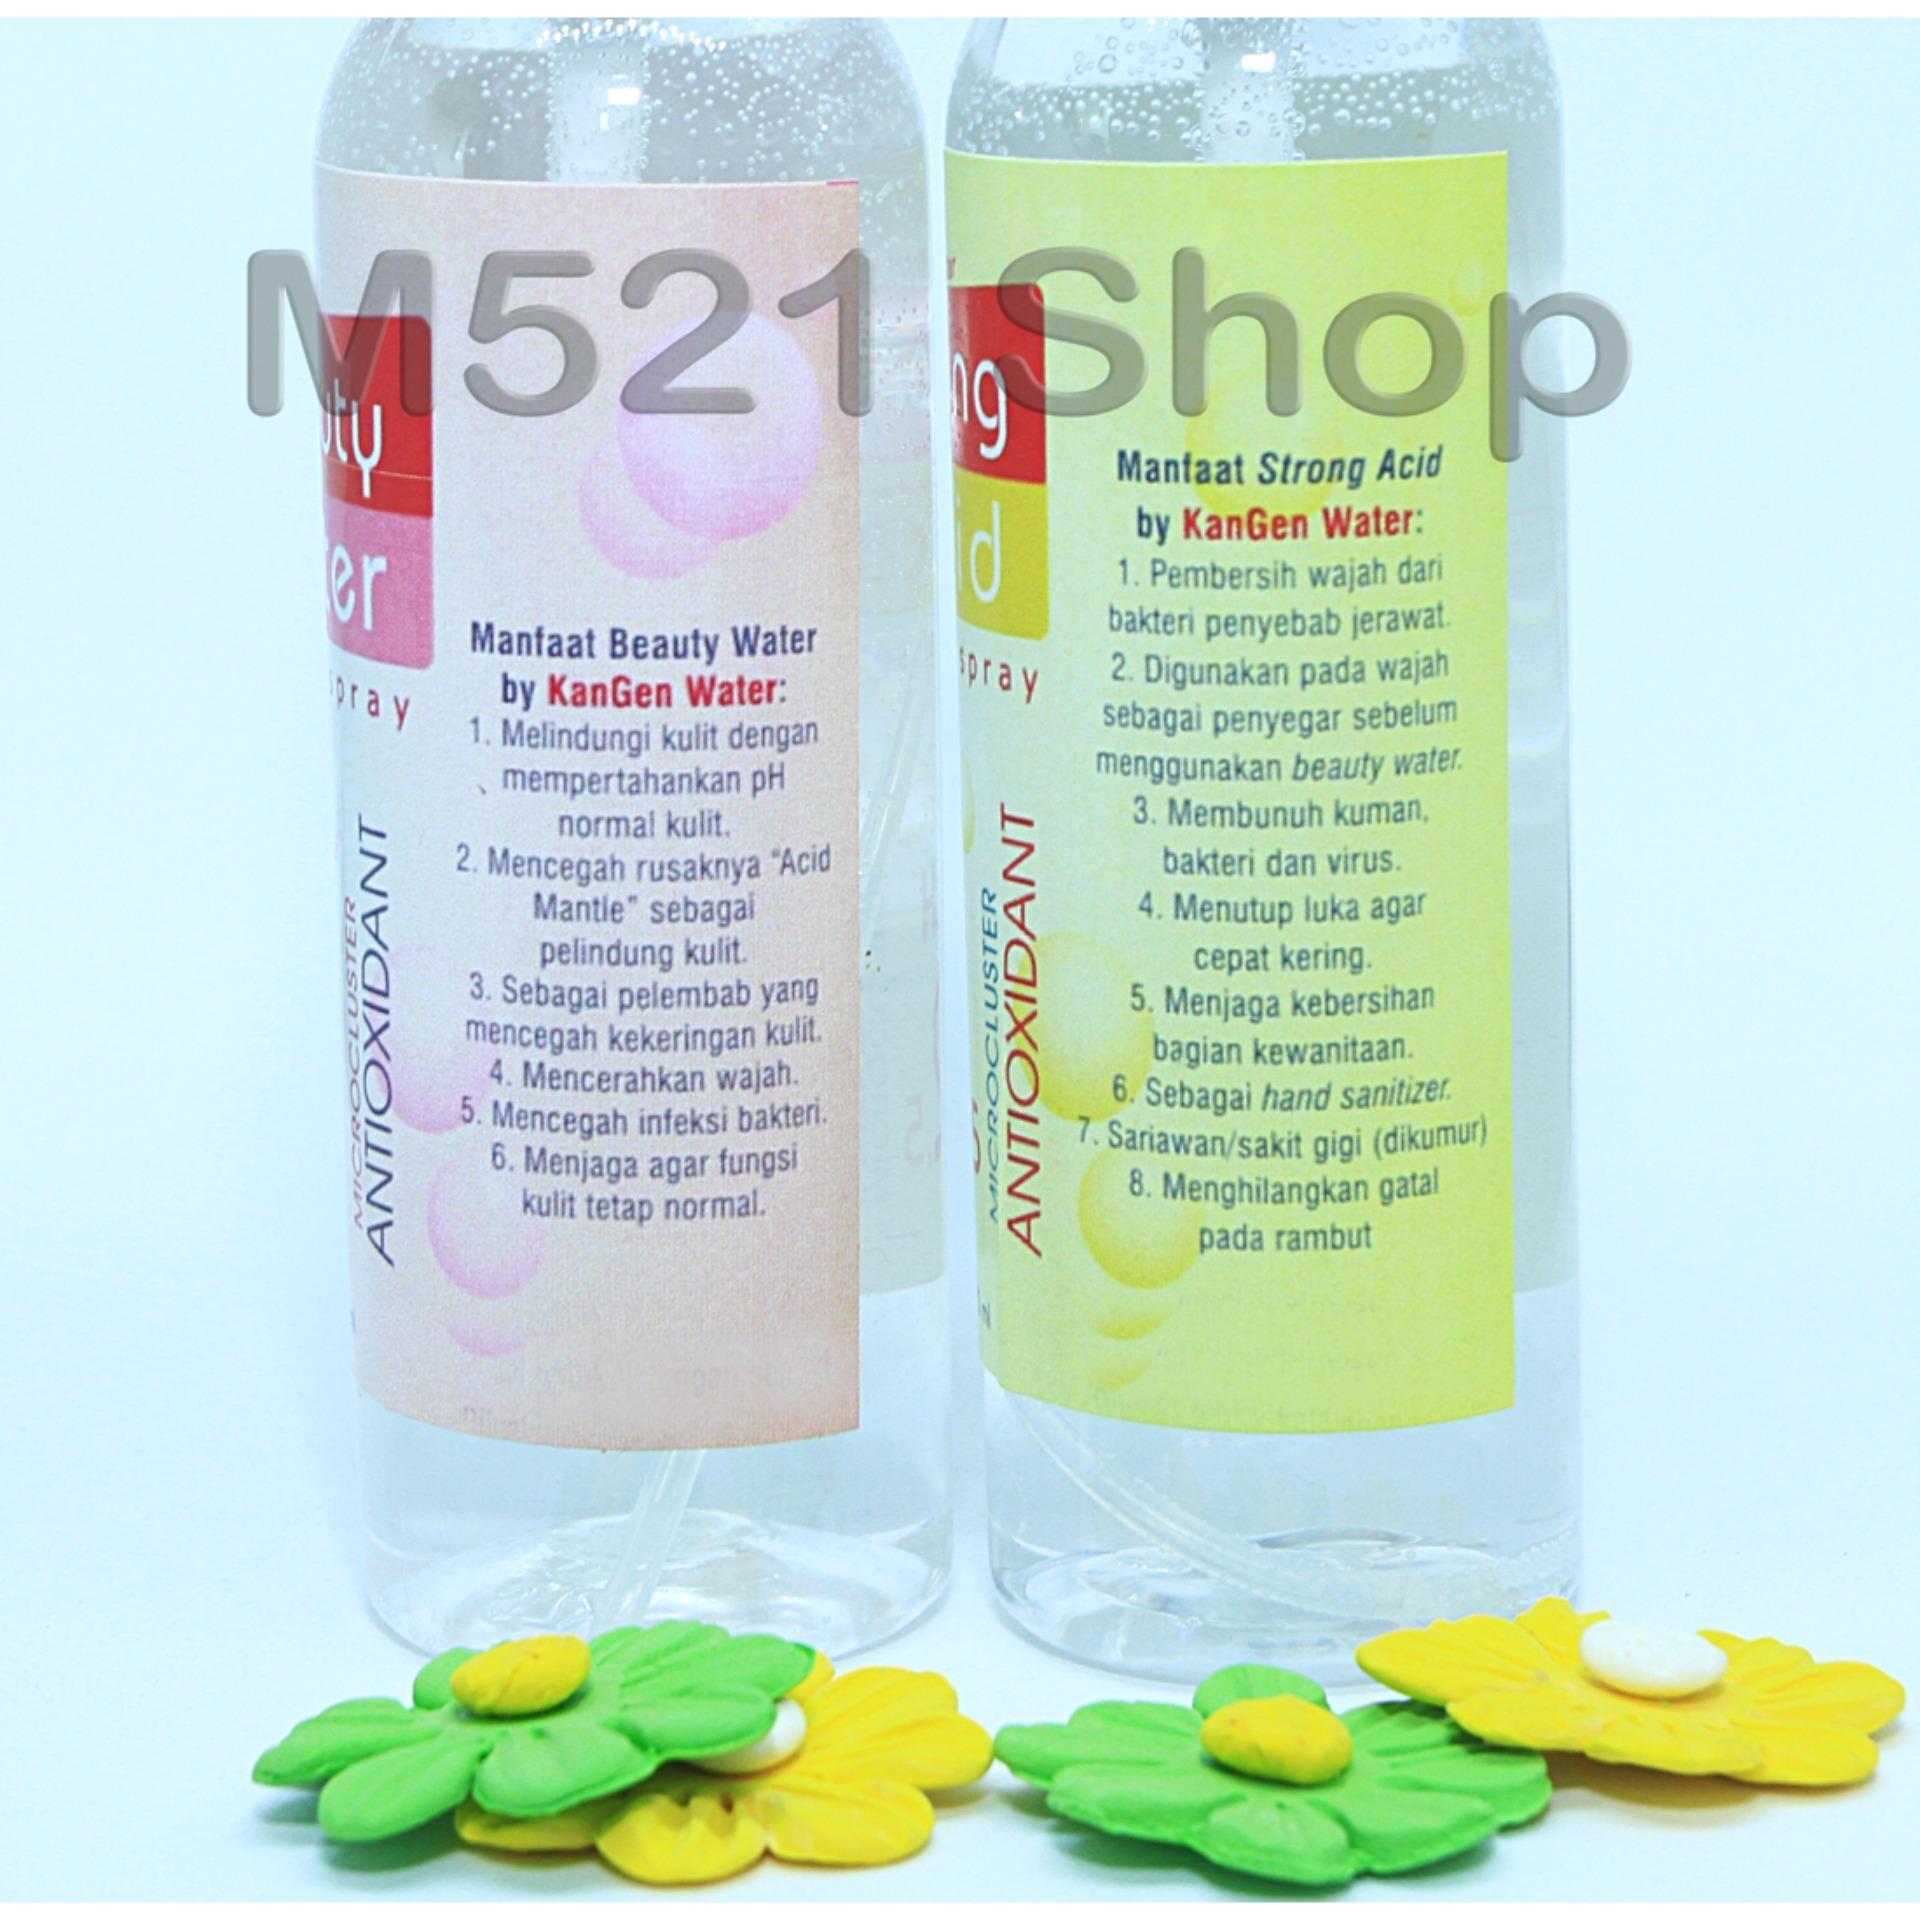 Periksa Peringkat Spray Wajah Strong Acid Dan Beauty Water 1 Set Isi 2 Botol